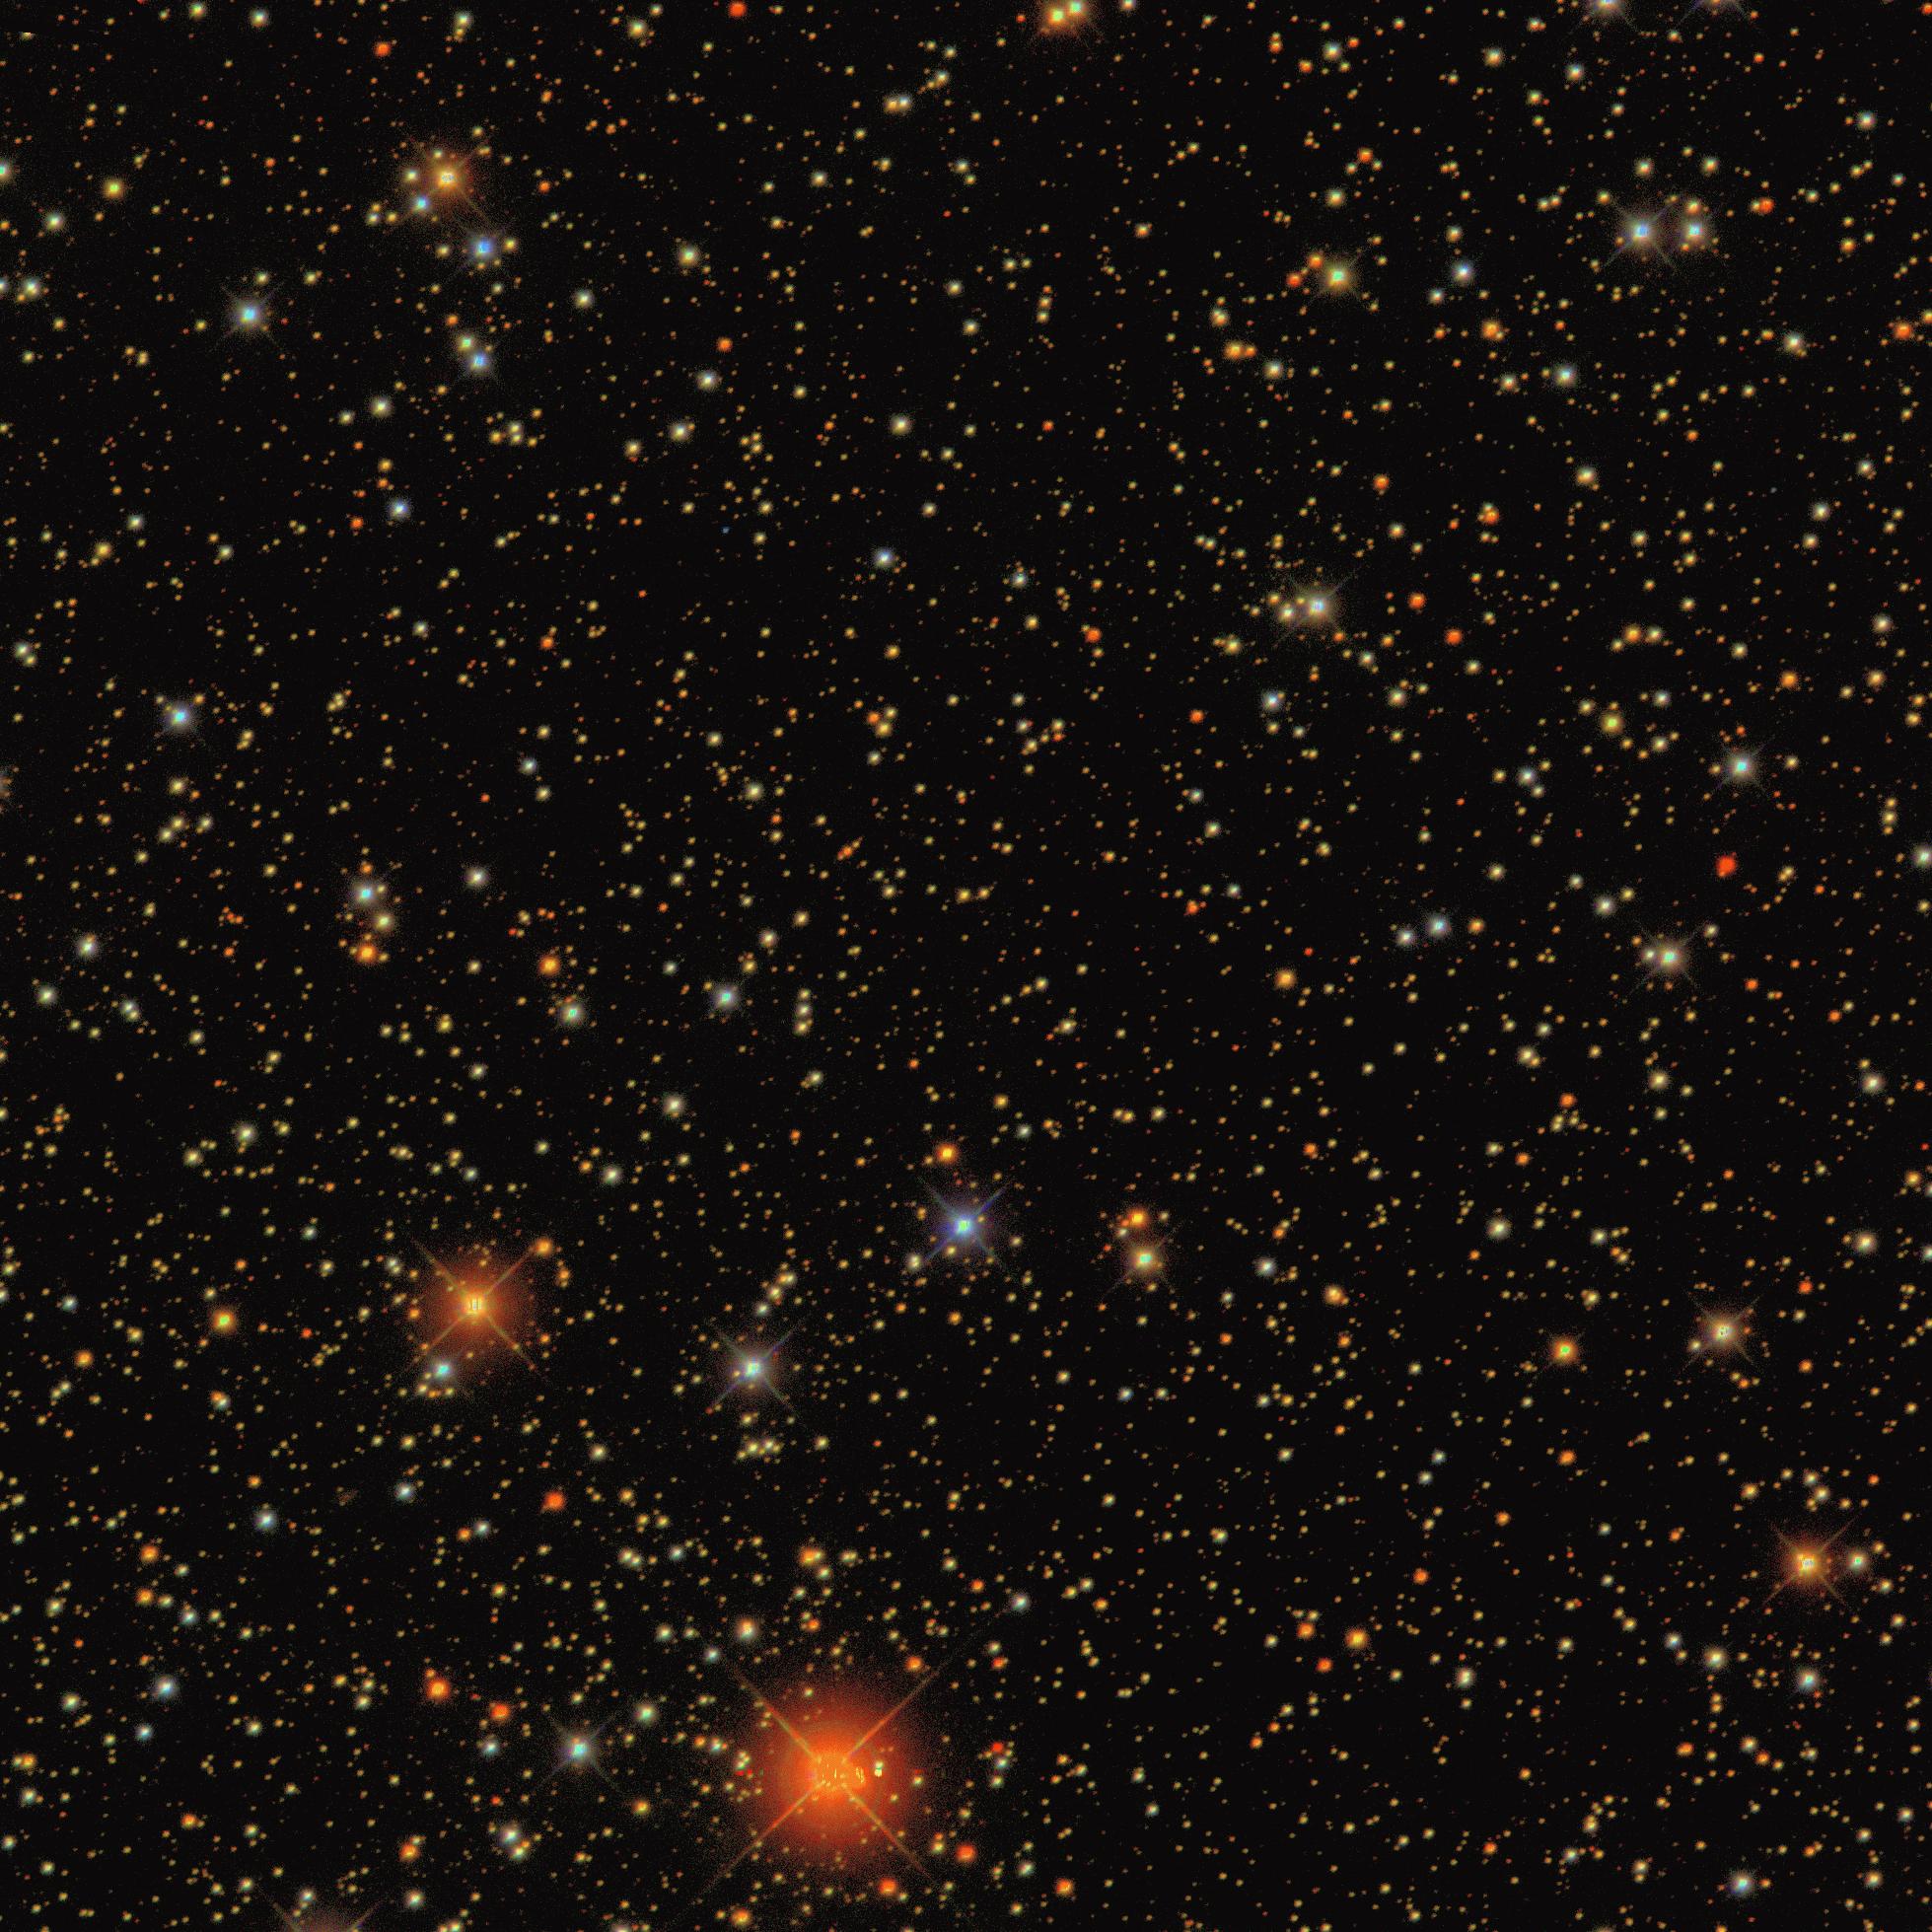 dwarf stars tell us how planets form